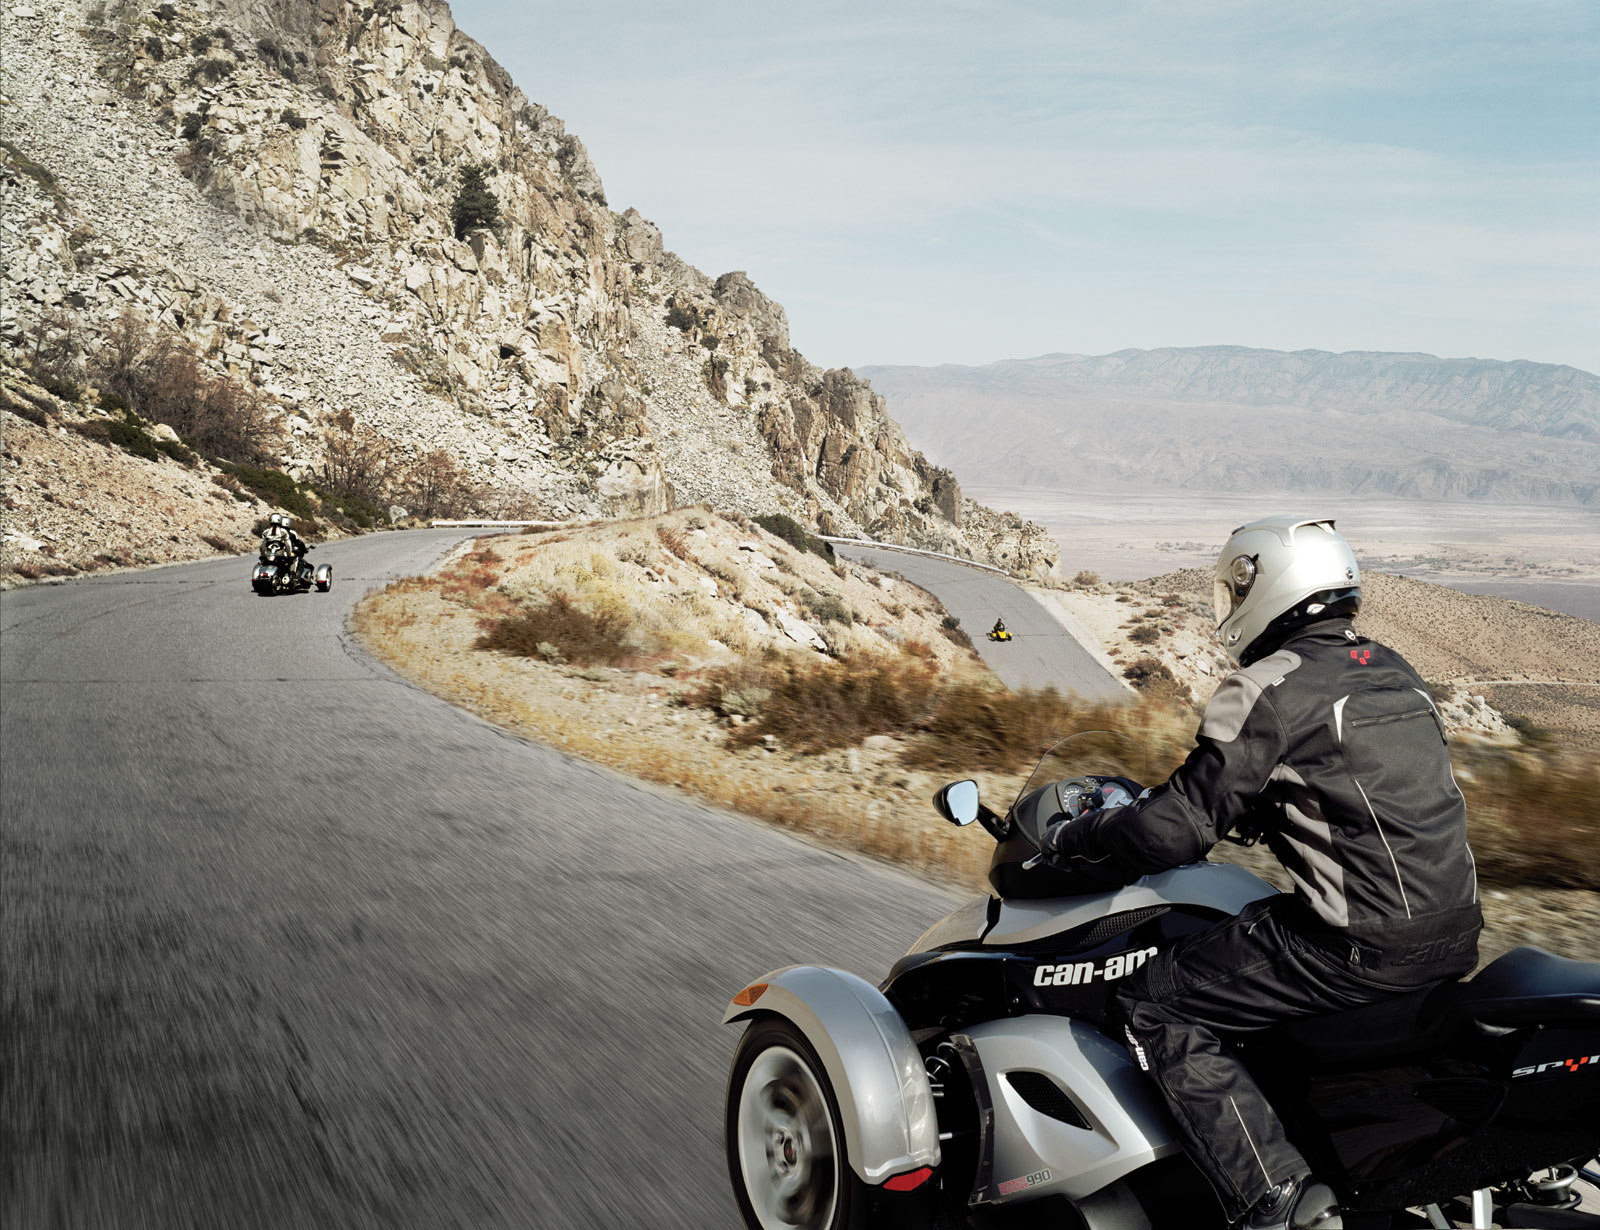 Can-Am Can-Am Spyder Roadster - Moto.ZombDrive.COM